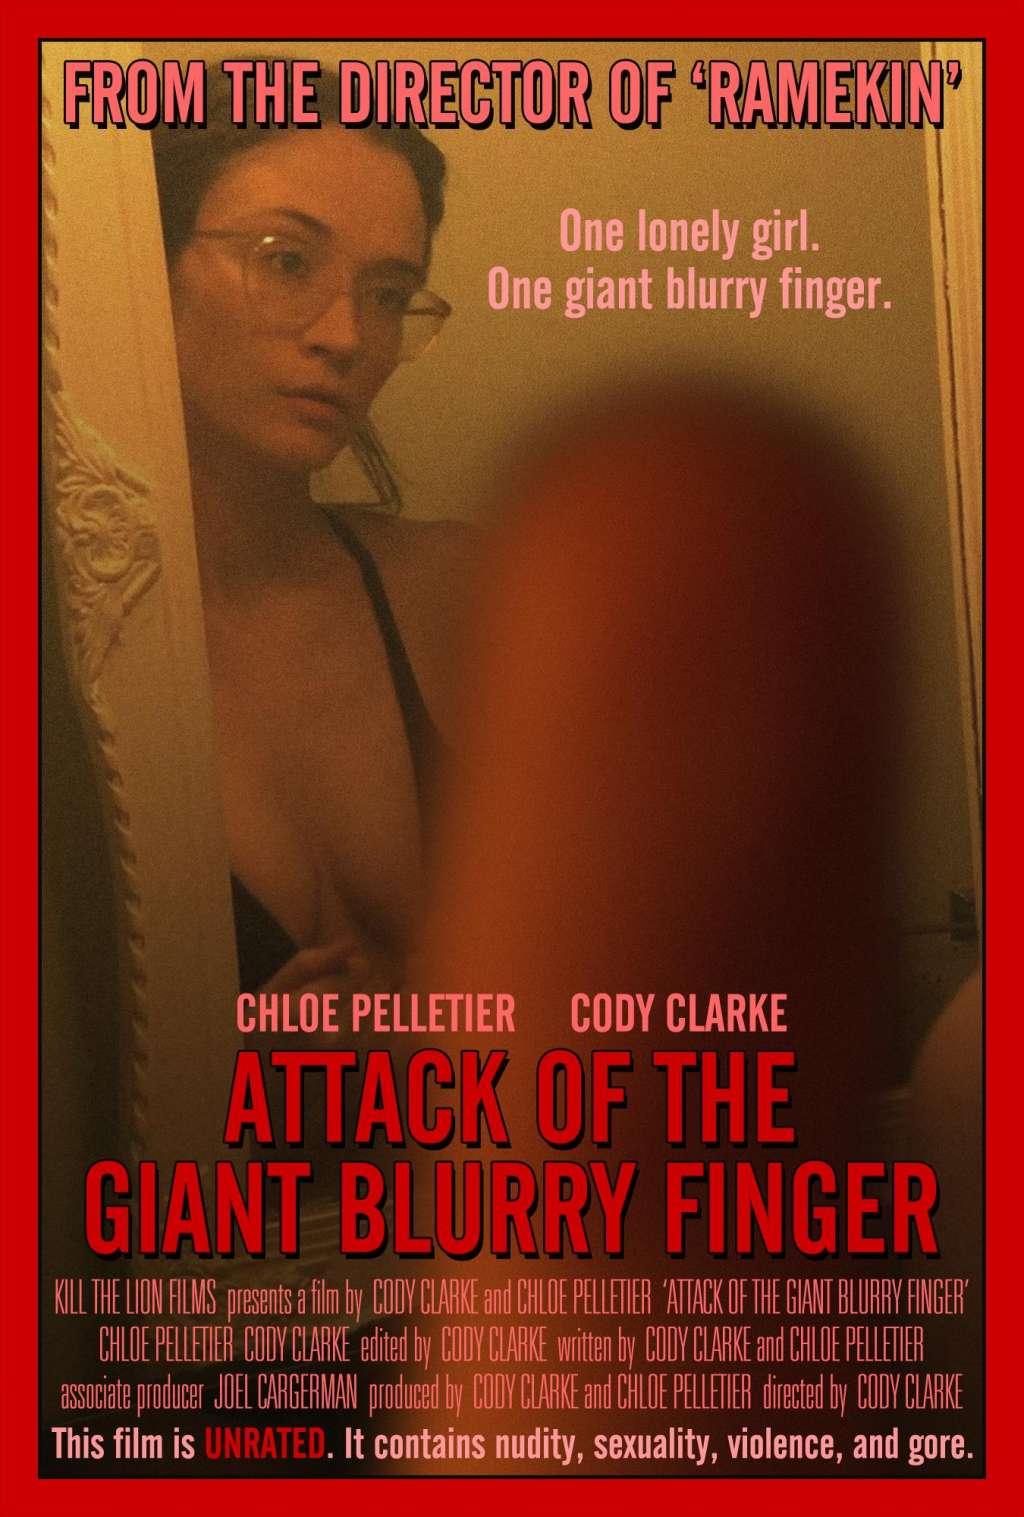 Attack of the Giant Blurry Finger kapak